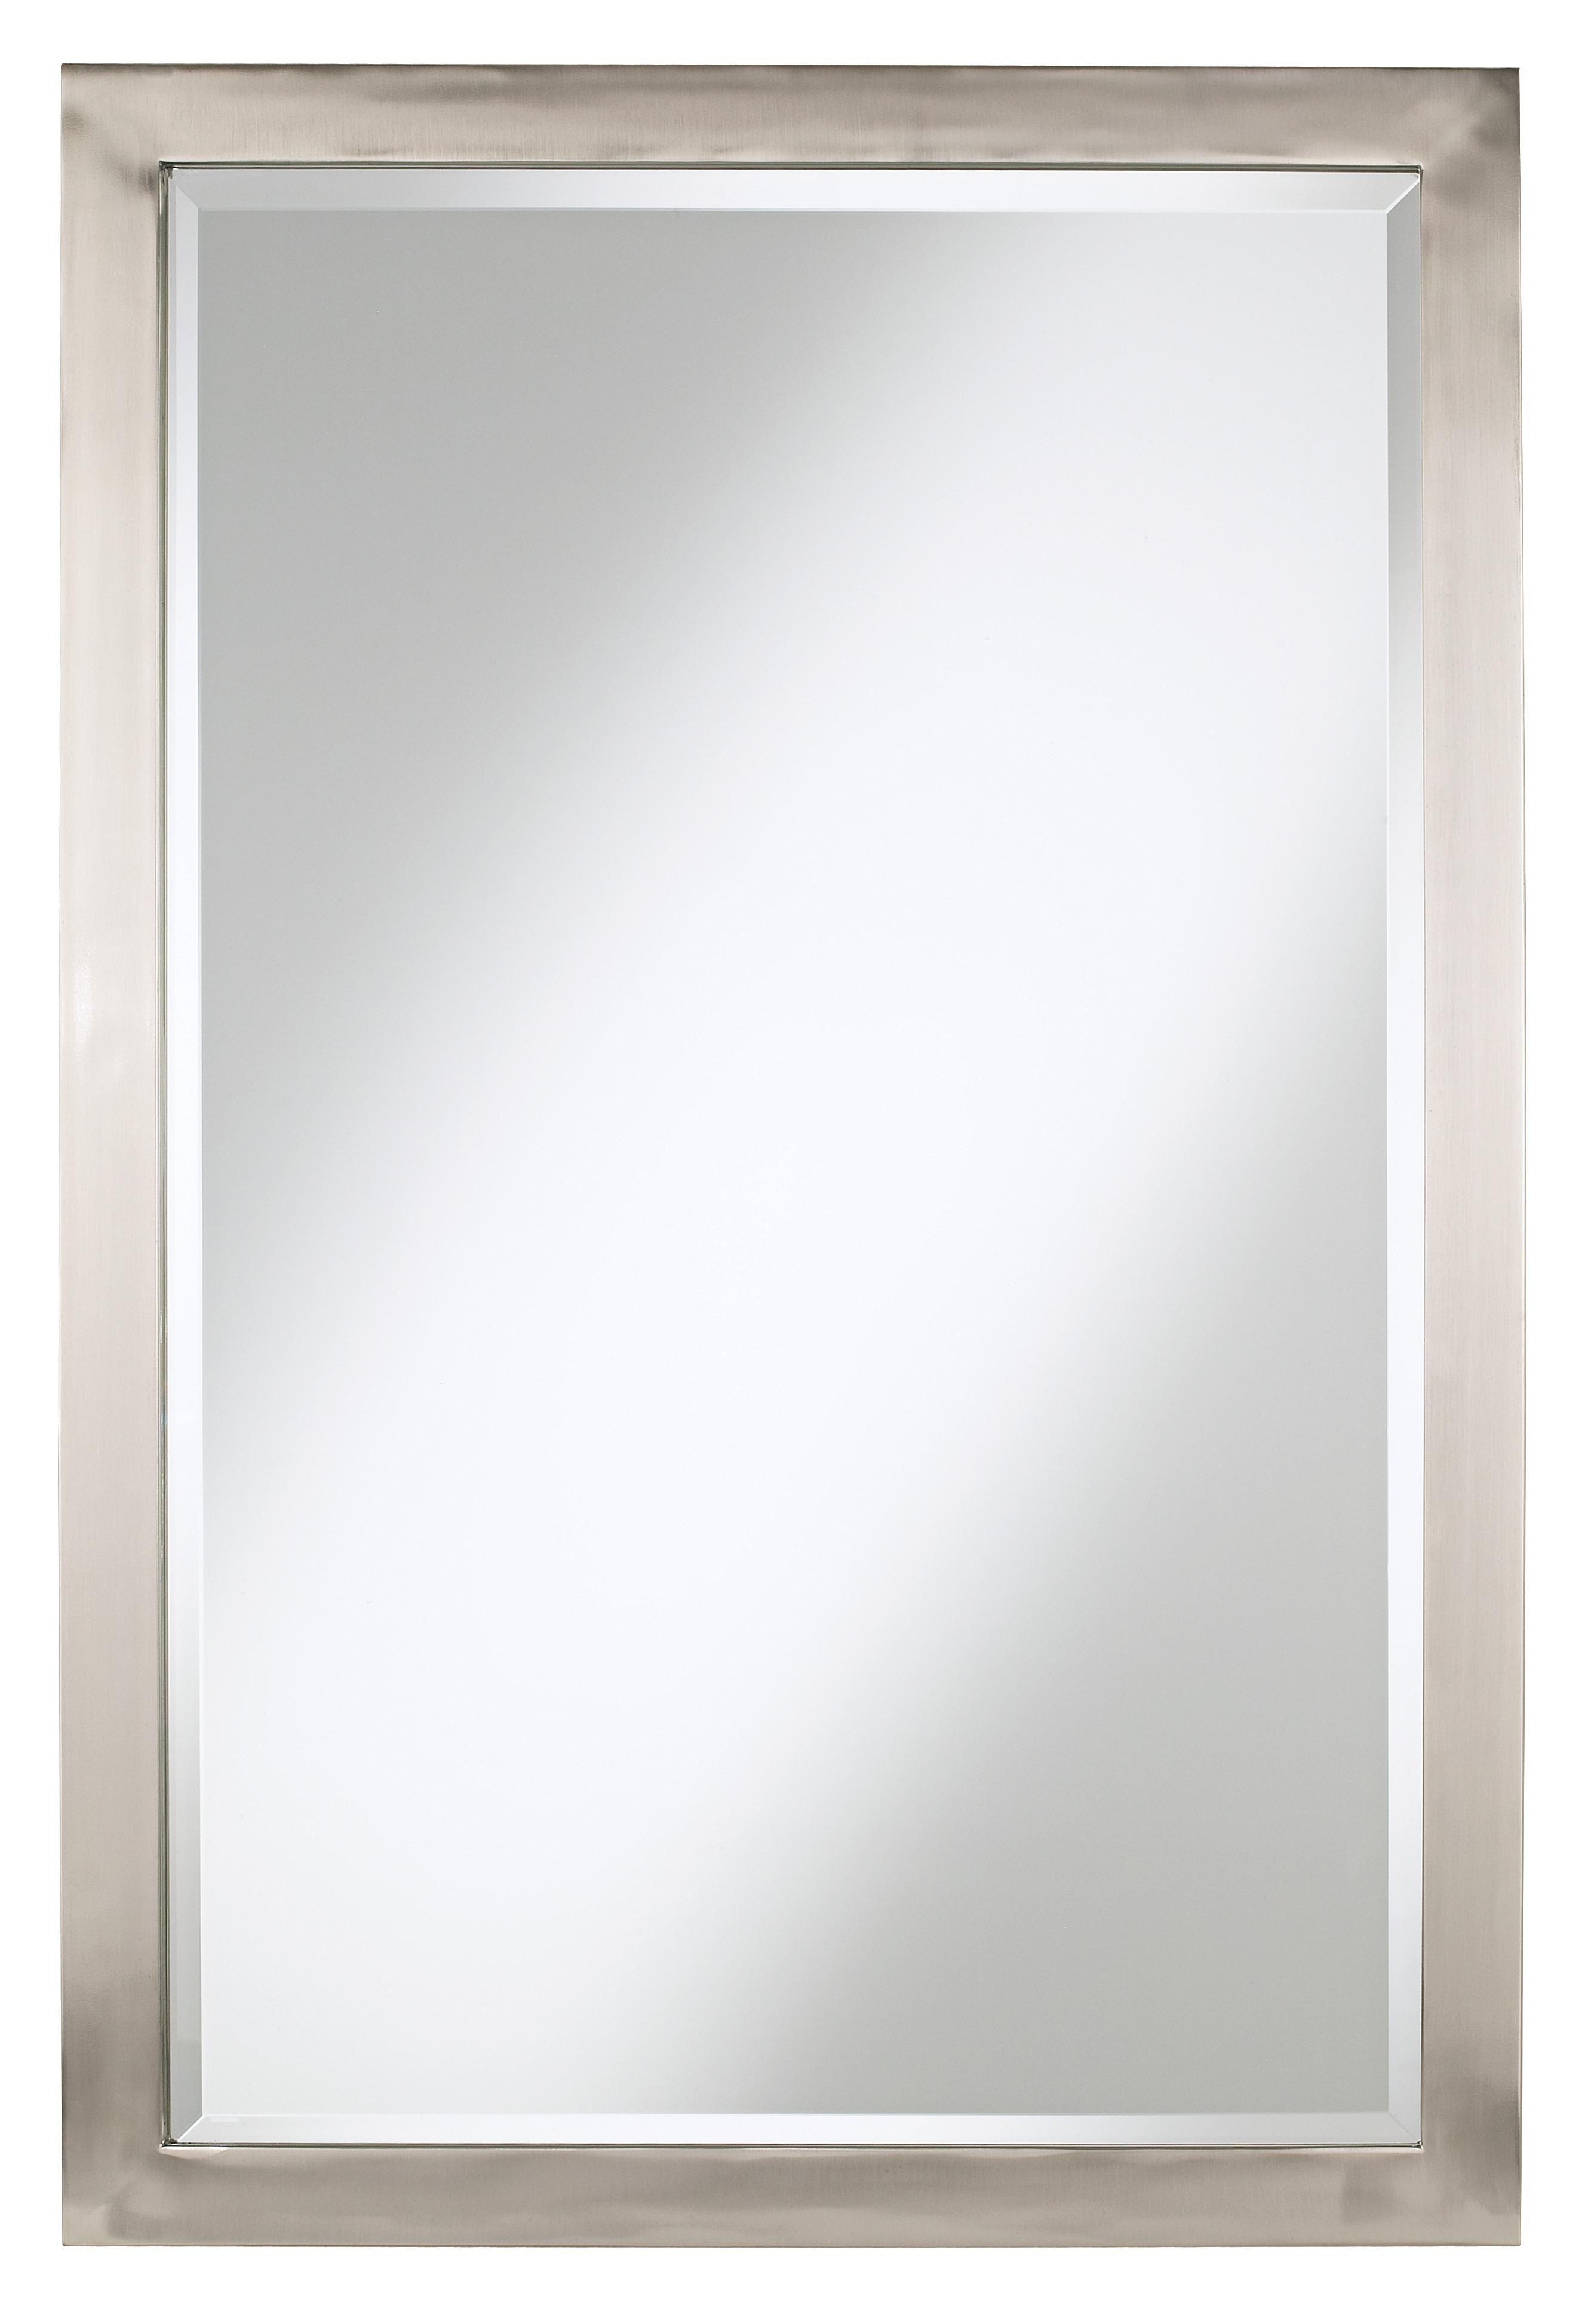 Metzeo 33 X 22 Brushed Nickel Wall Mirror T4543 Lamps Plus Metal Mirror Possini Euro Design Mirror Designs